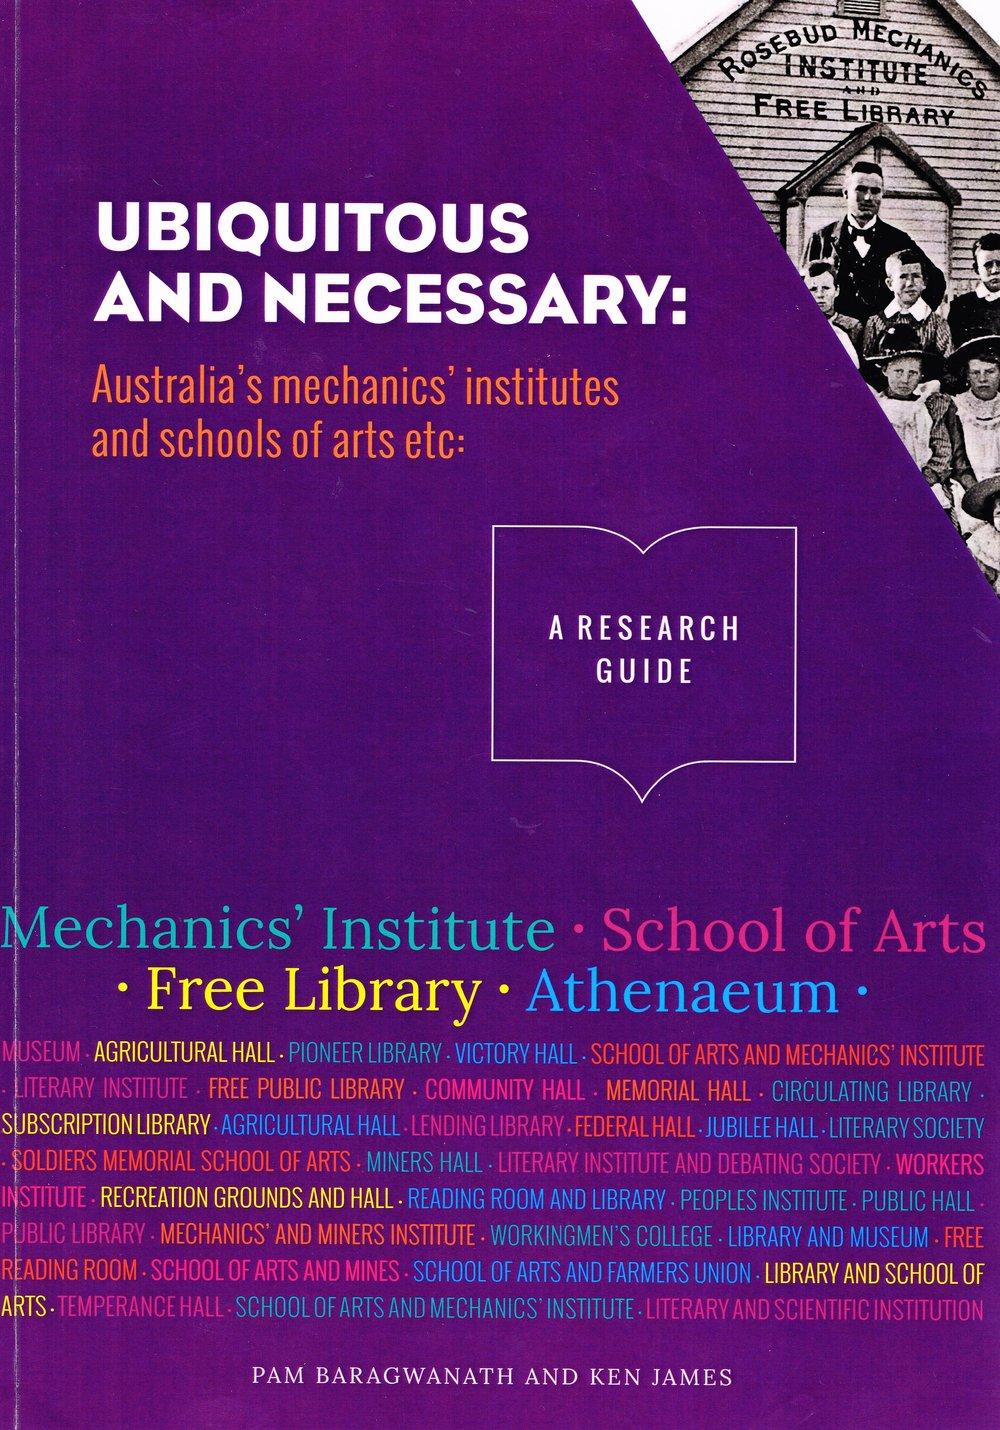 Ubiquitous and Necessary : Australia's mechanics' institutes and schools of arts etc Pam Baragwanath and Ken James